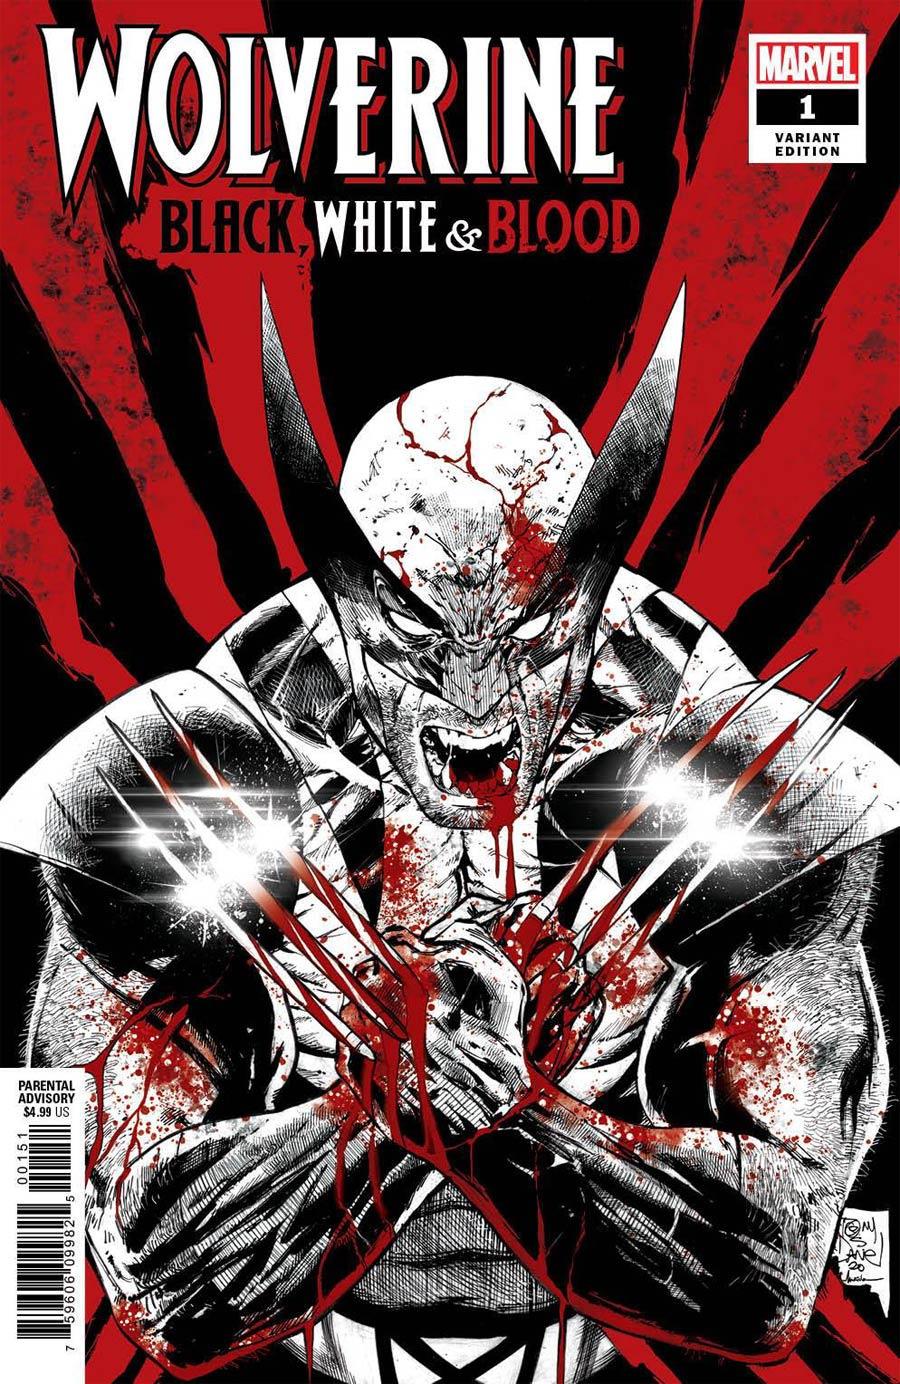 Wolverine Black White & Blood #1 MISPRINT Cover C Incentive Tony S Daniel Variant Cover